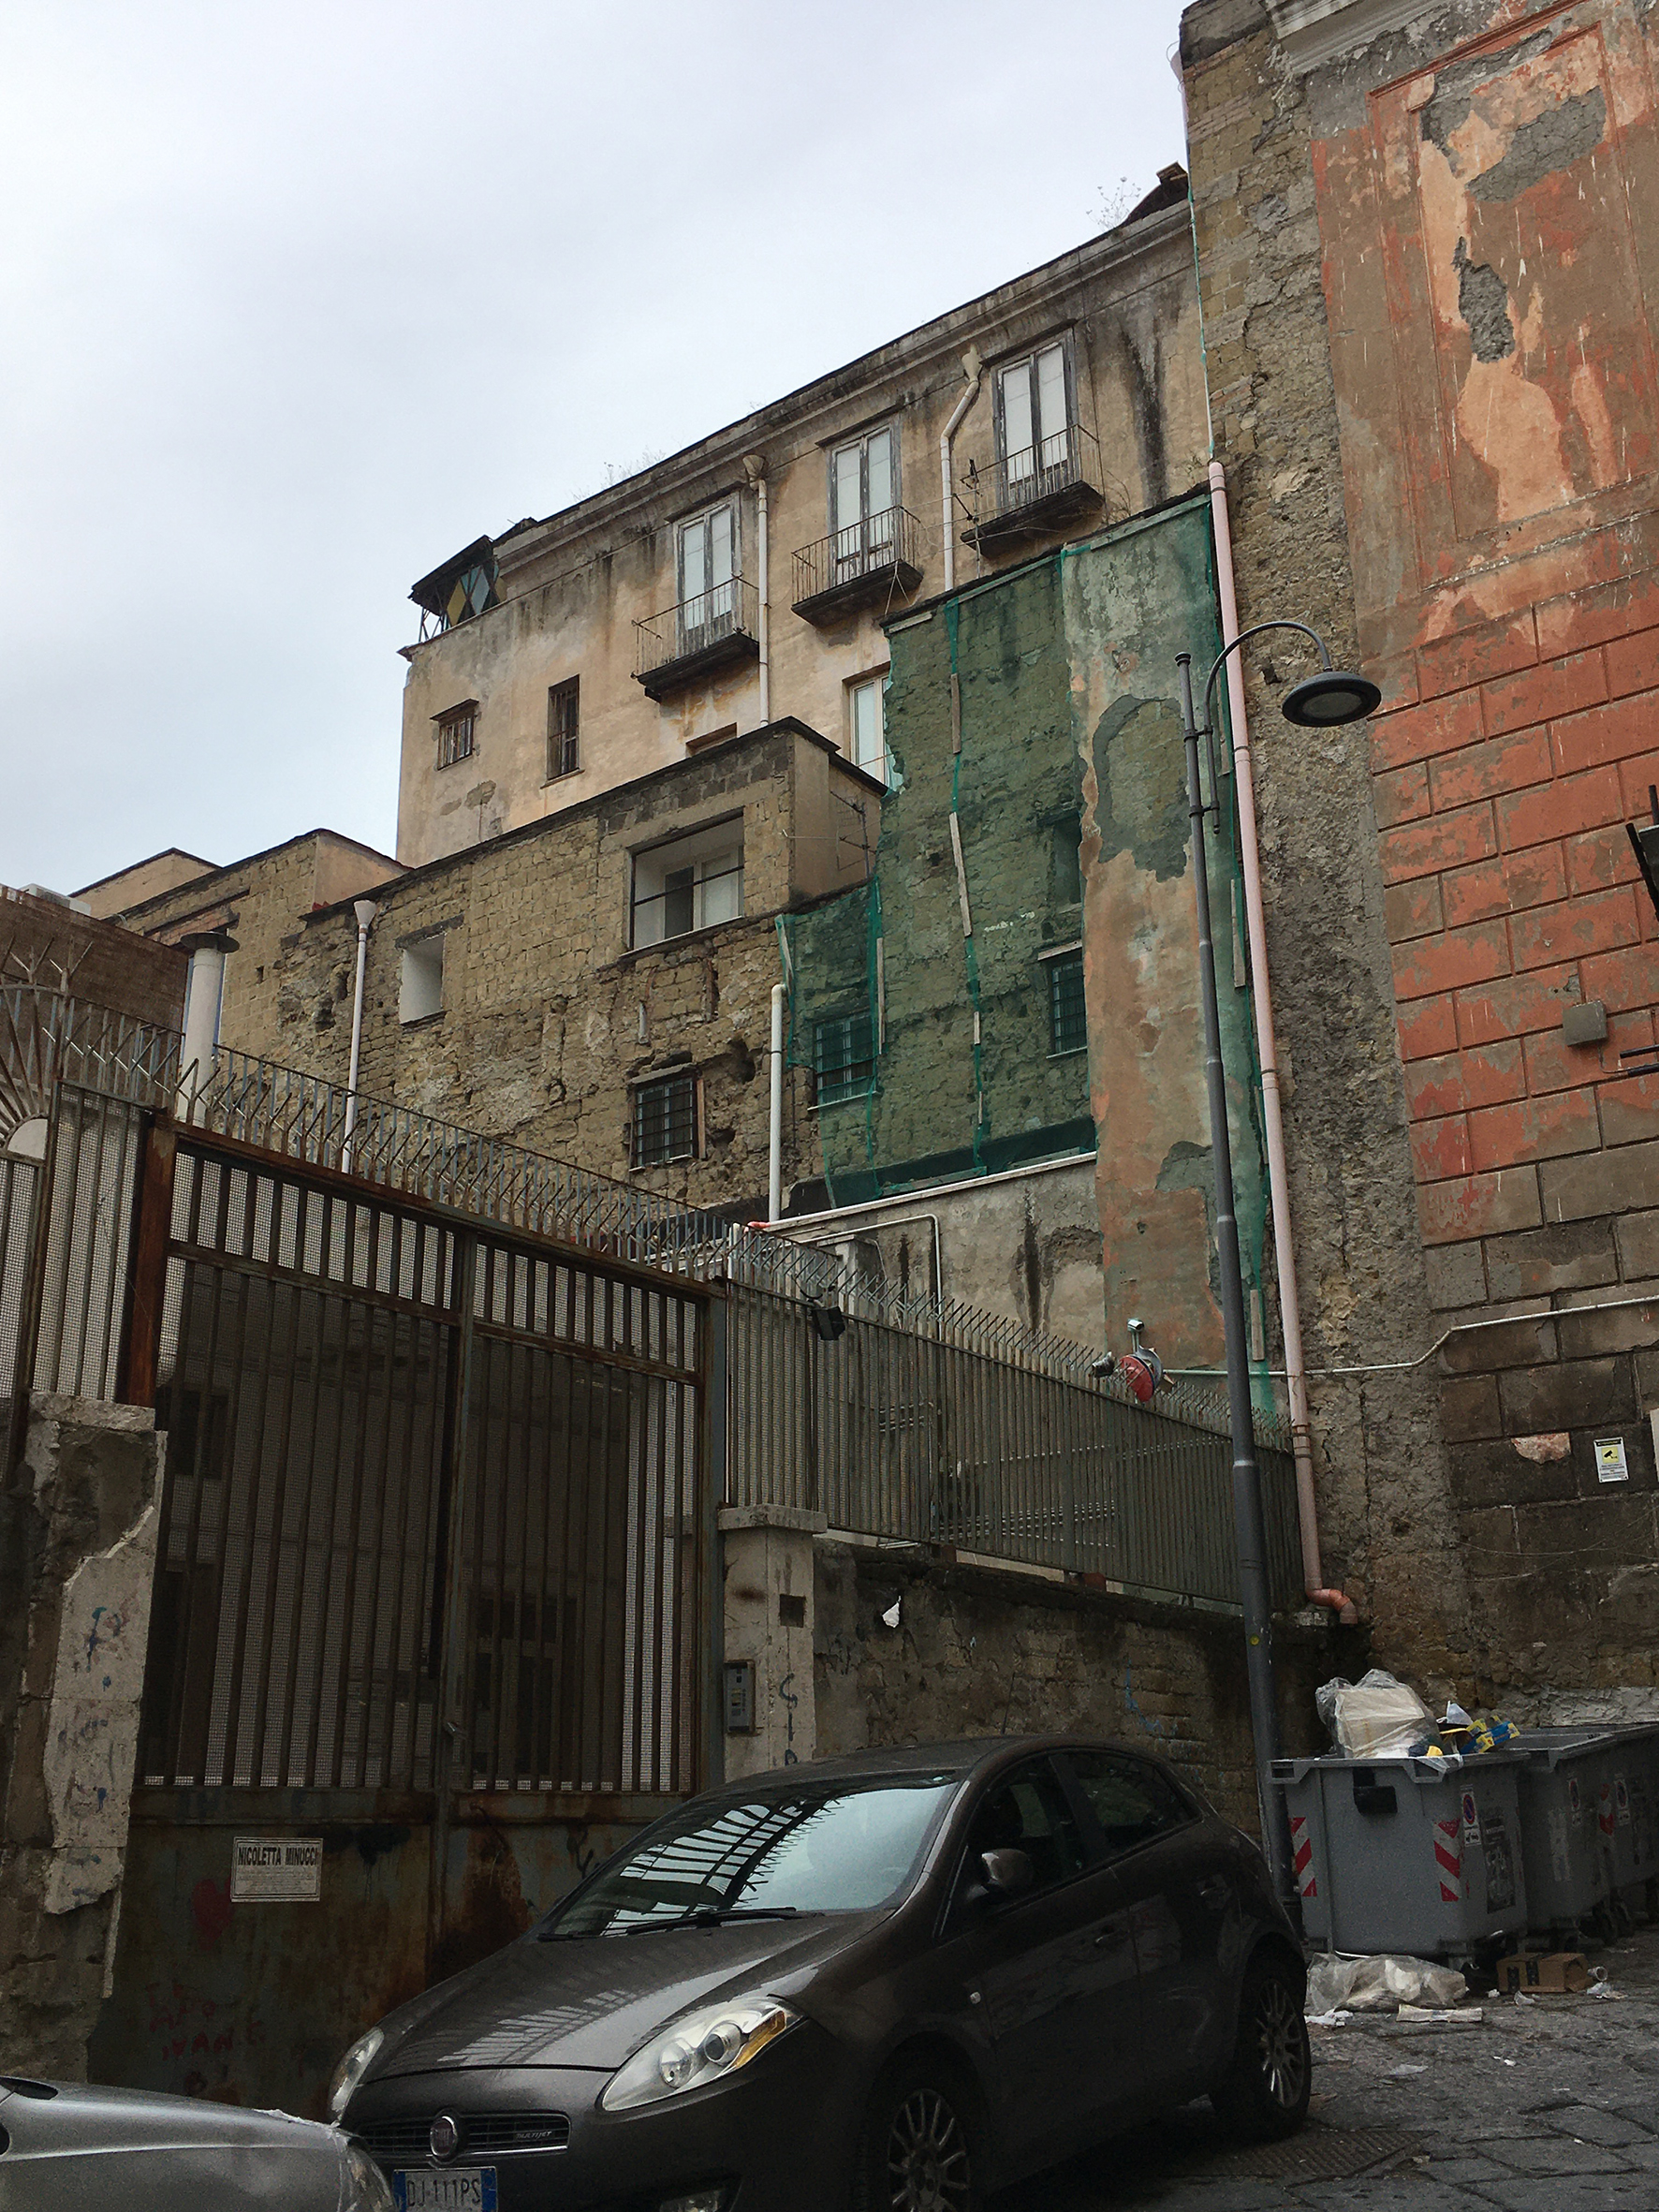 Ospedale (ospedale, pubblico) - Napoli (NA)